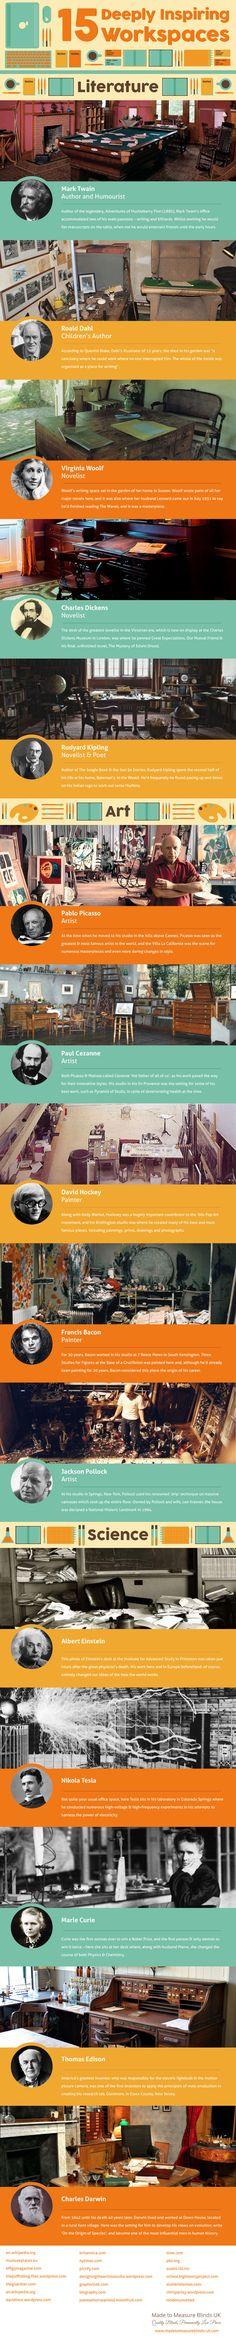 Inspiring-workspaces